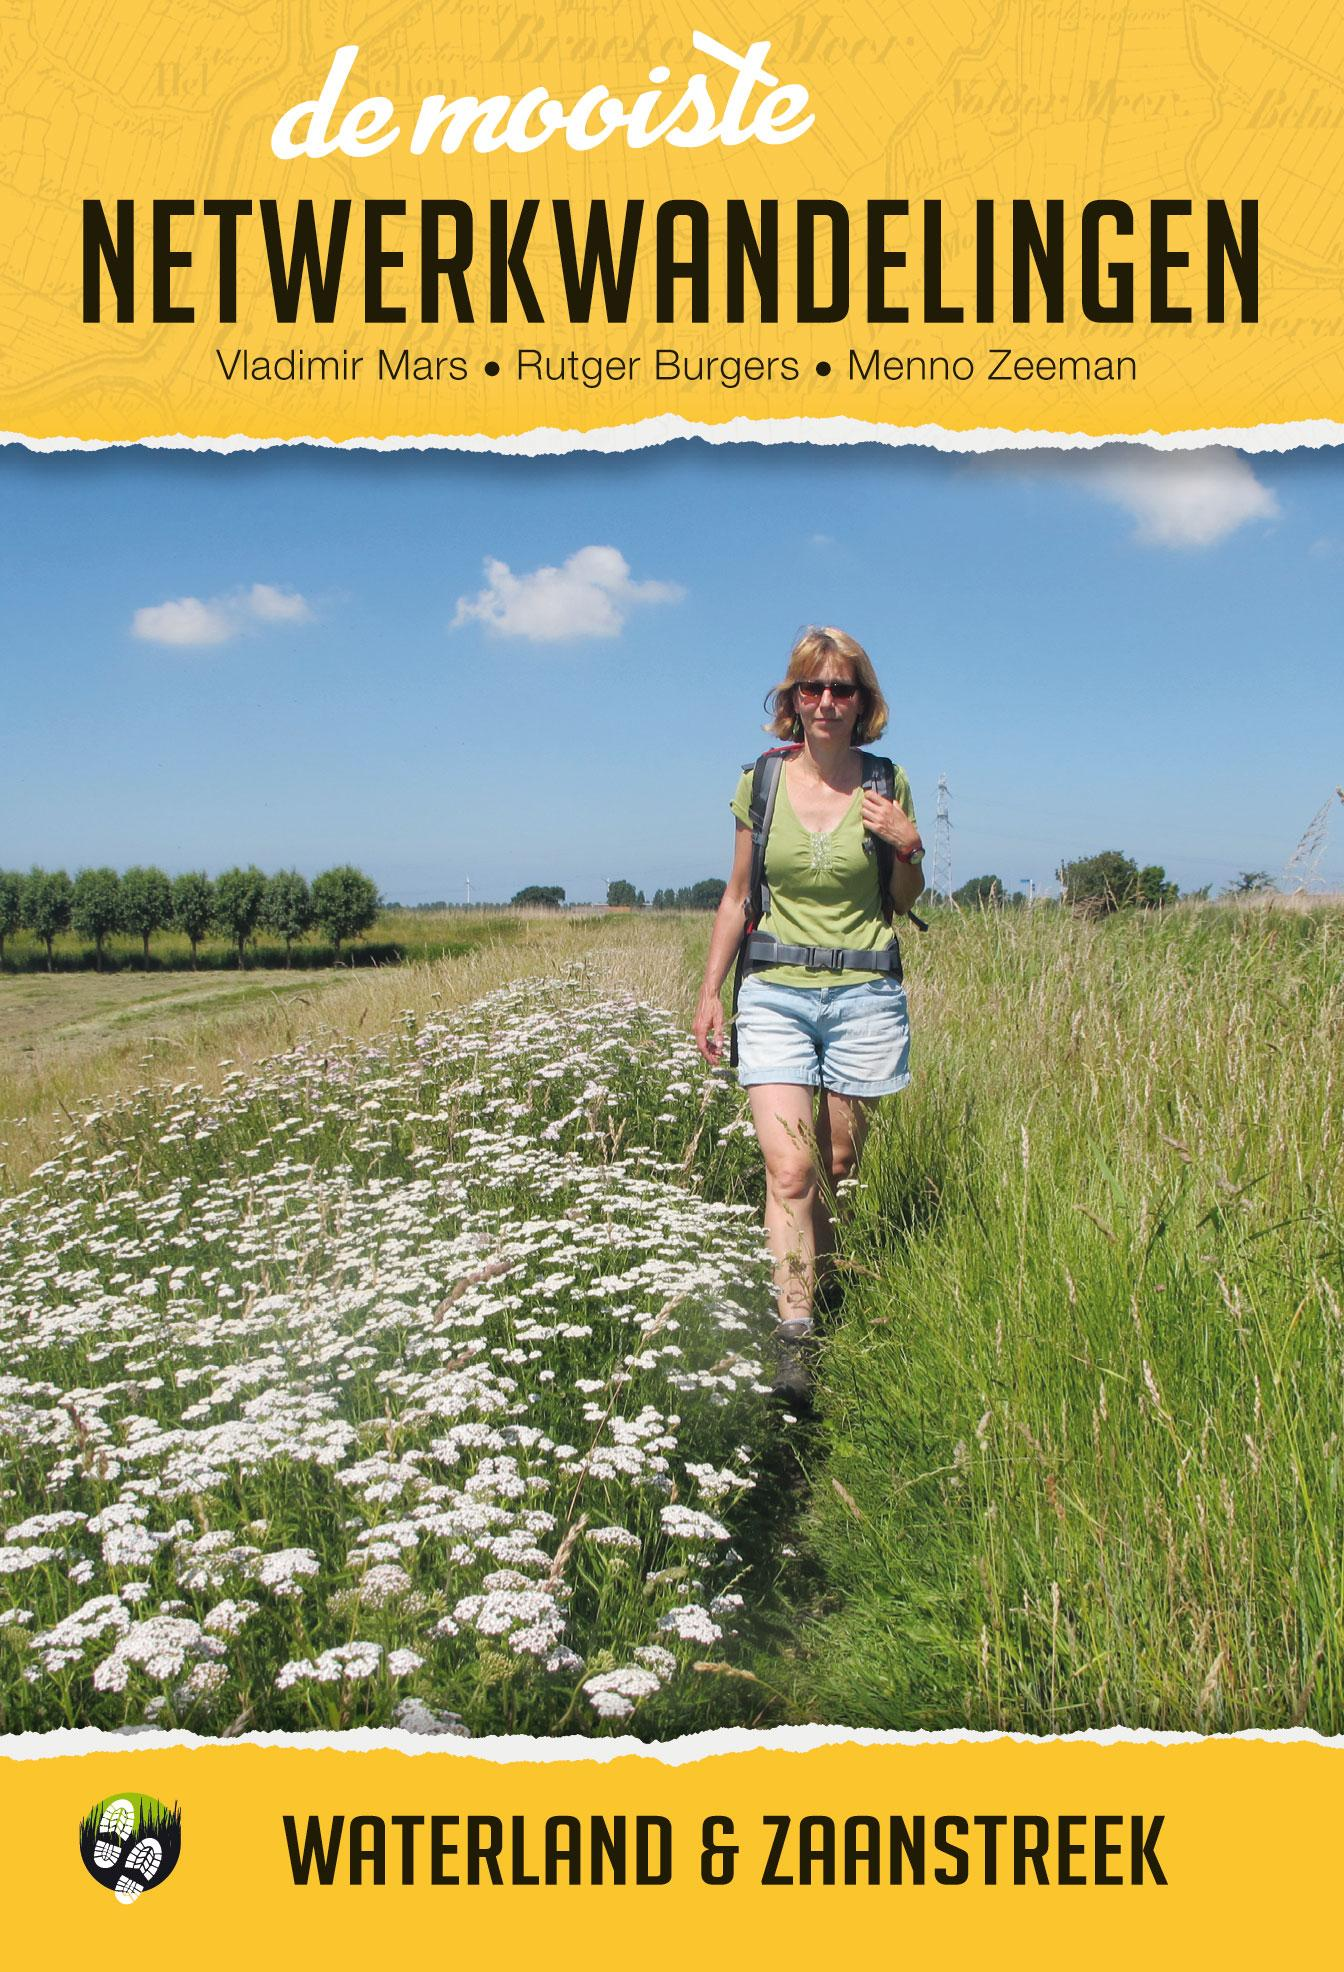 Wandelgids 'Waterland & Zaanstreek'